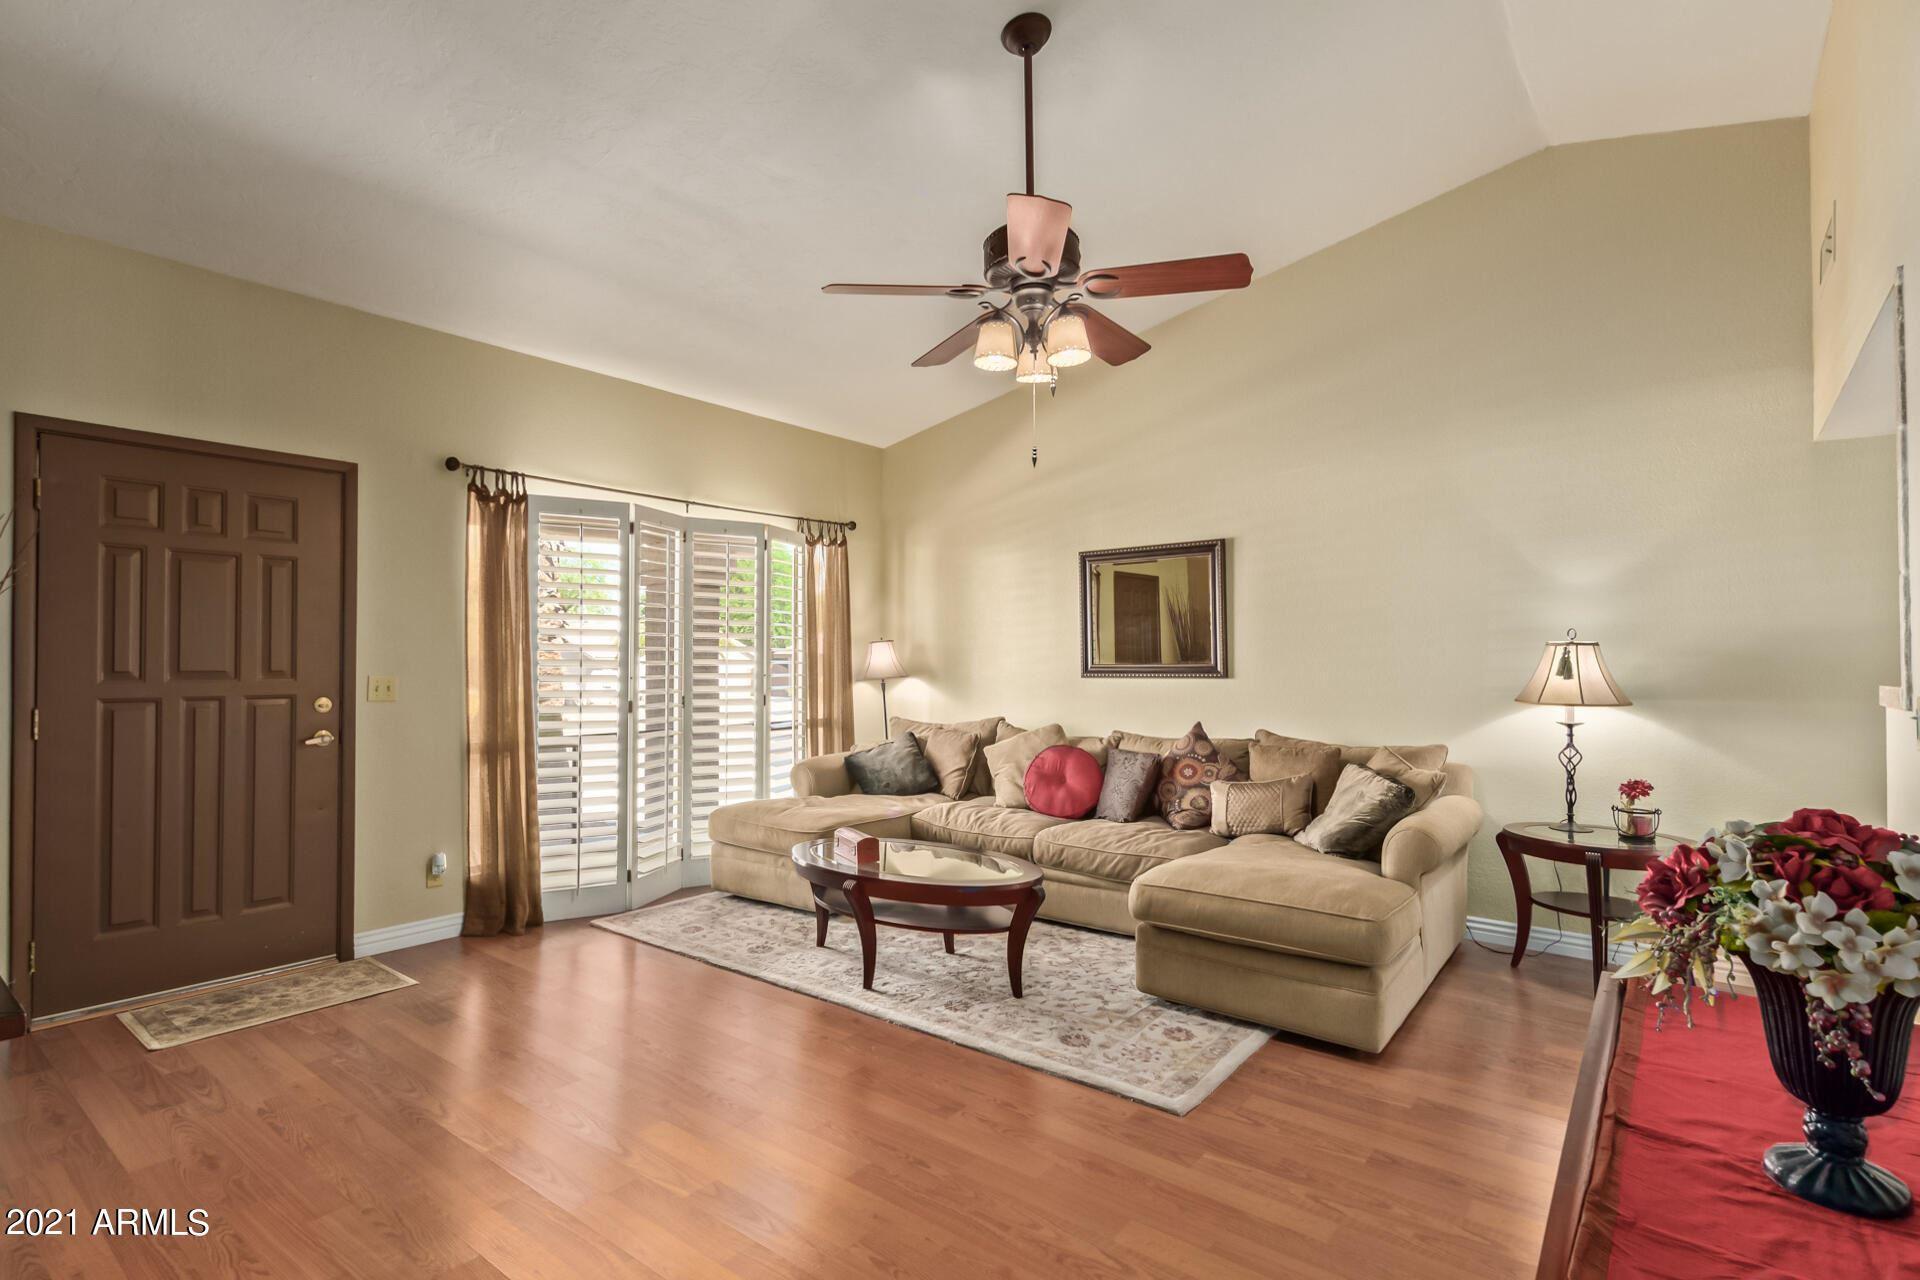 Photo of 17333 E ROSITA Drive, Fountain Hills, AZ 85268 (MLS # 6304030)